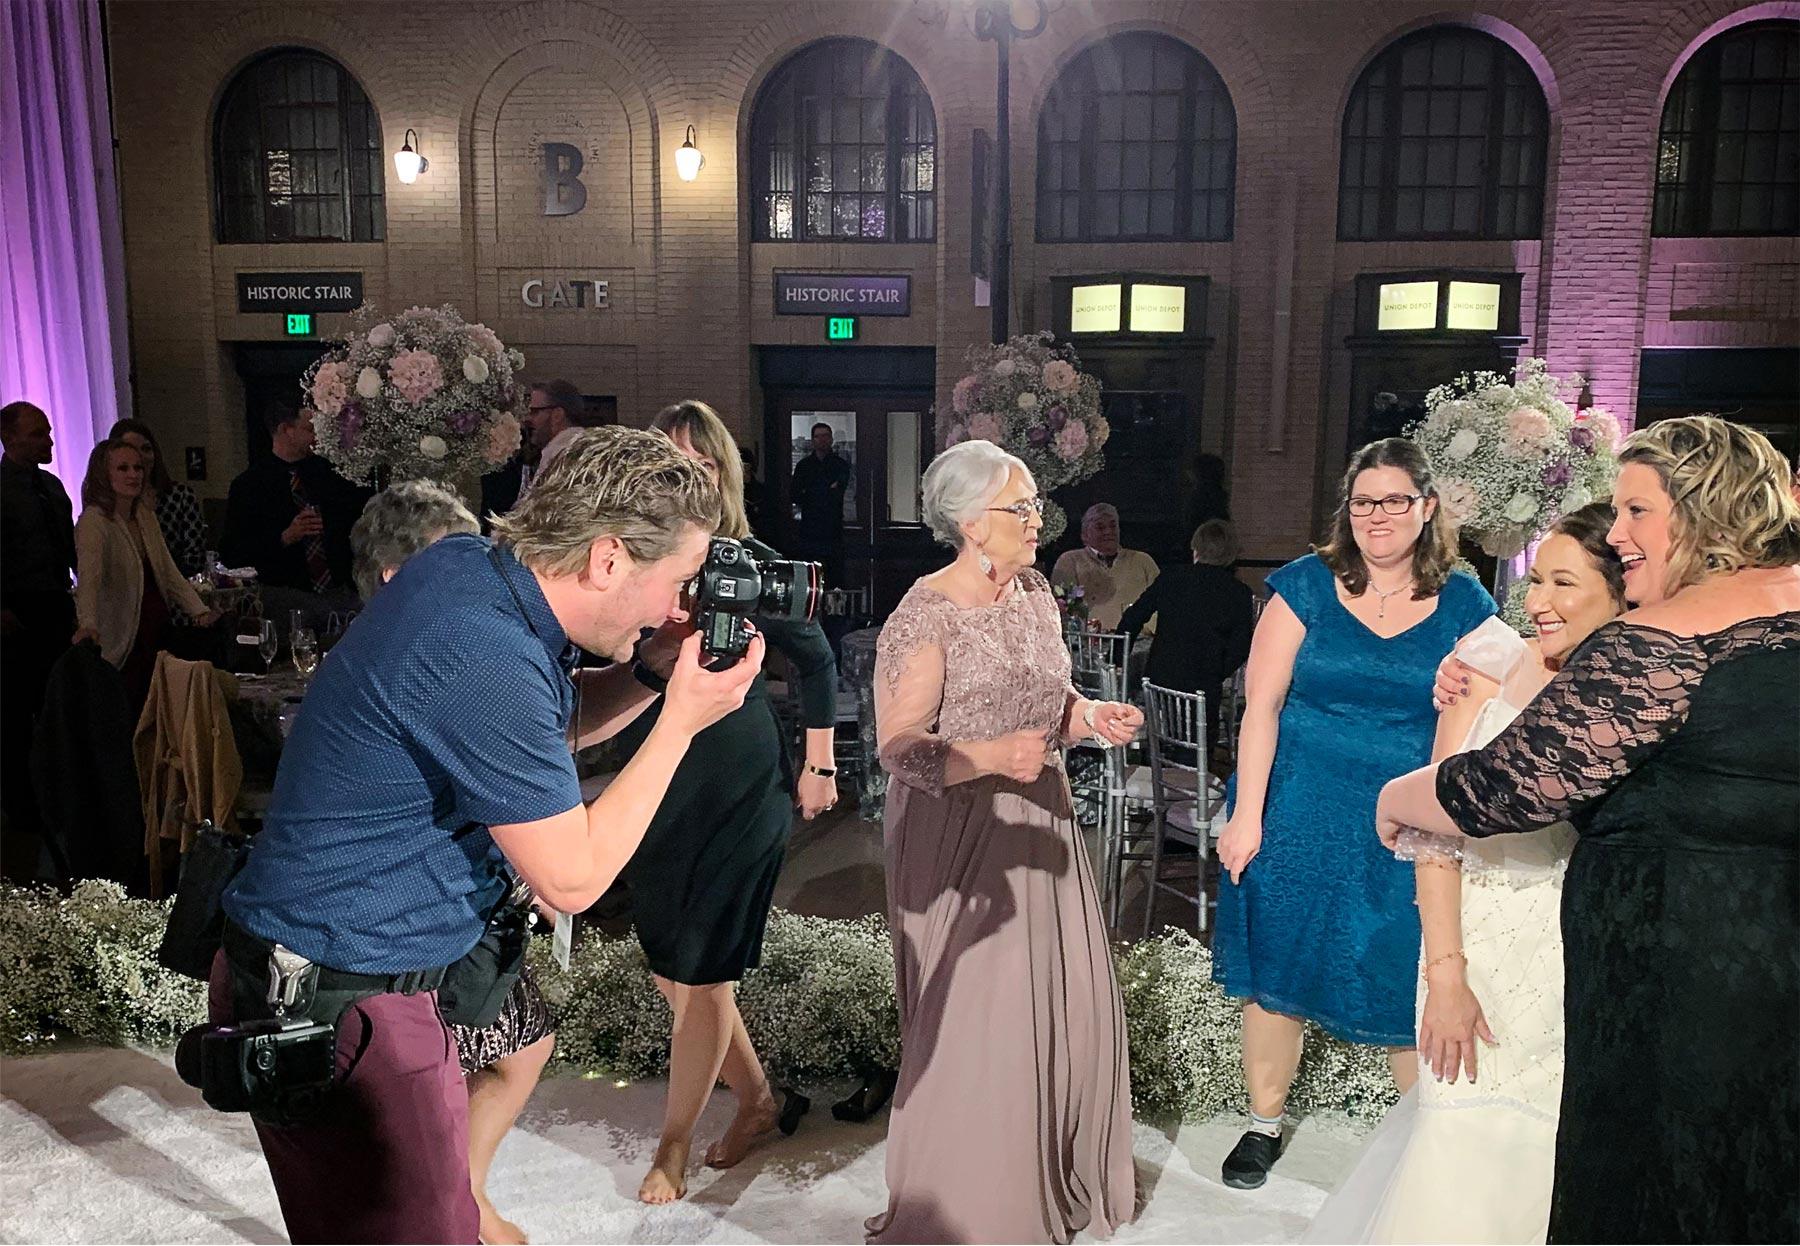 14-Andrew-Vick-Photography-My-Great-Big-Live-Wedding-with-David-Tutera-Behind-the-Scenes-Minnesota-Union-Depot-Saint-Paul.jpg